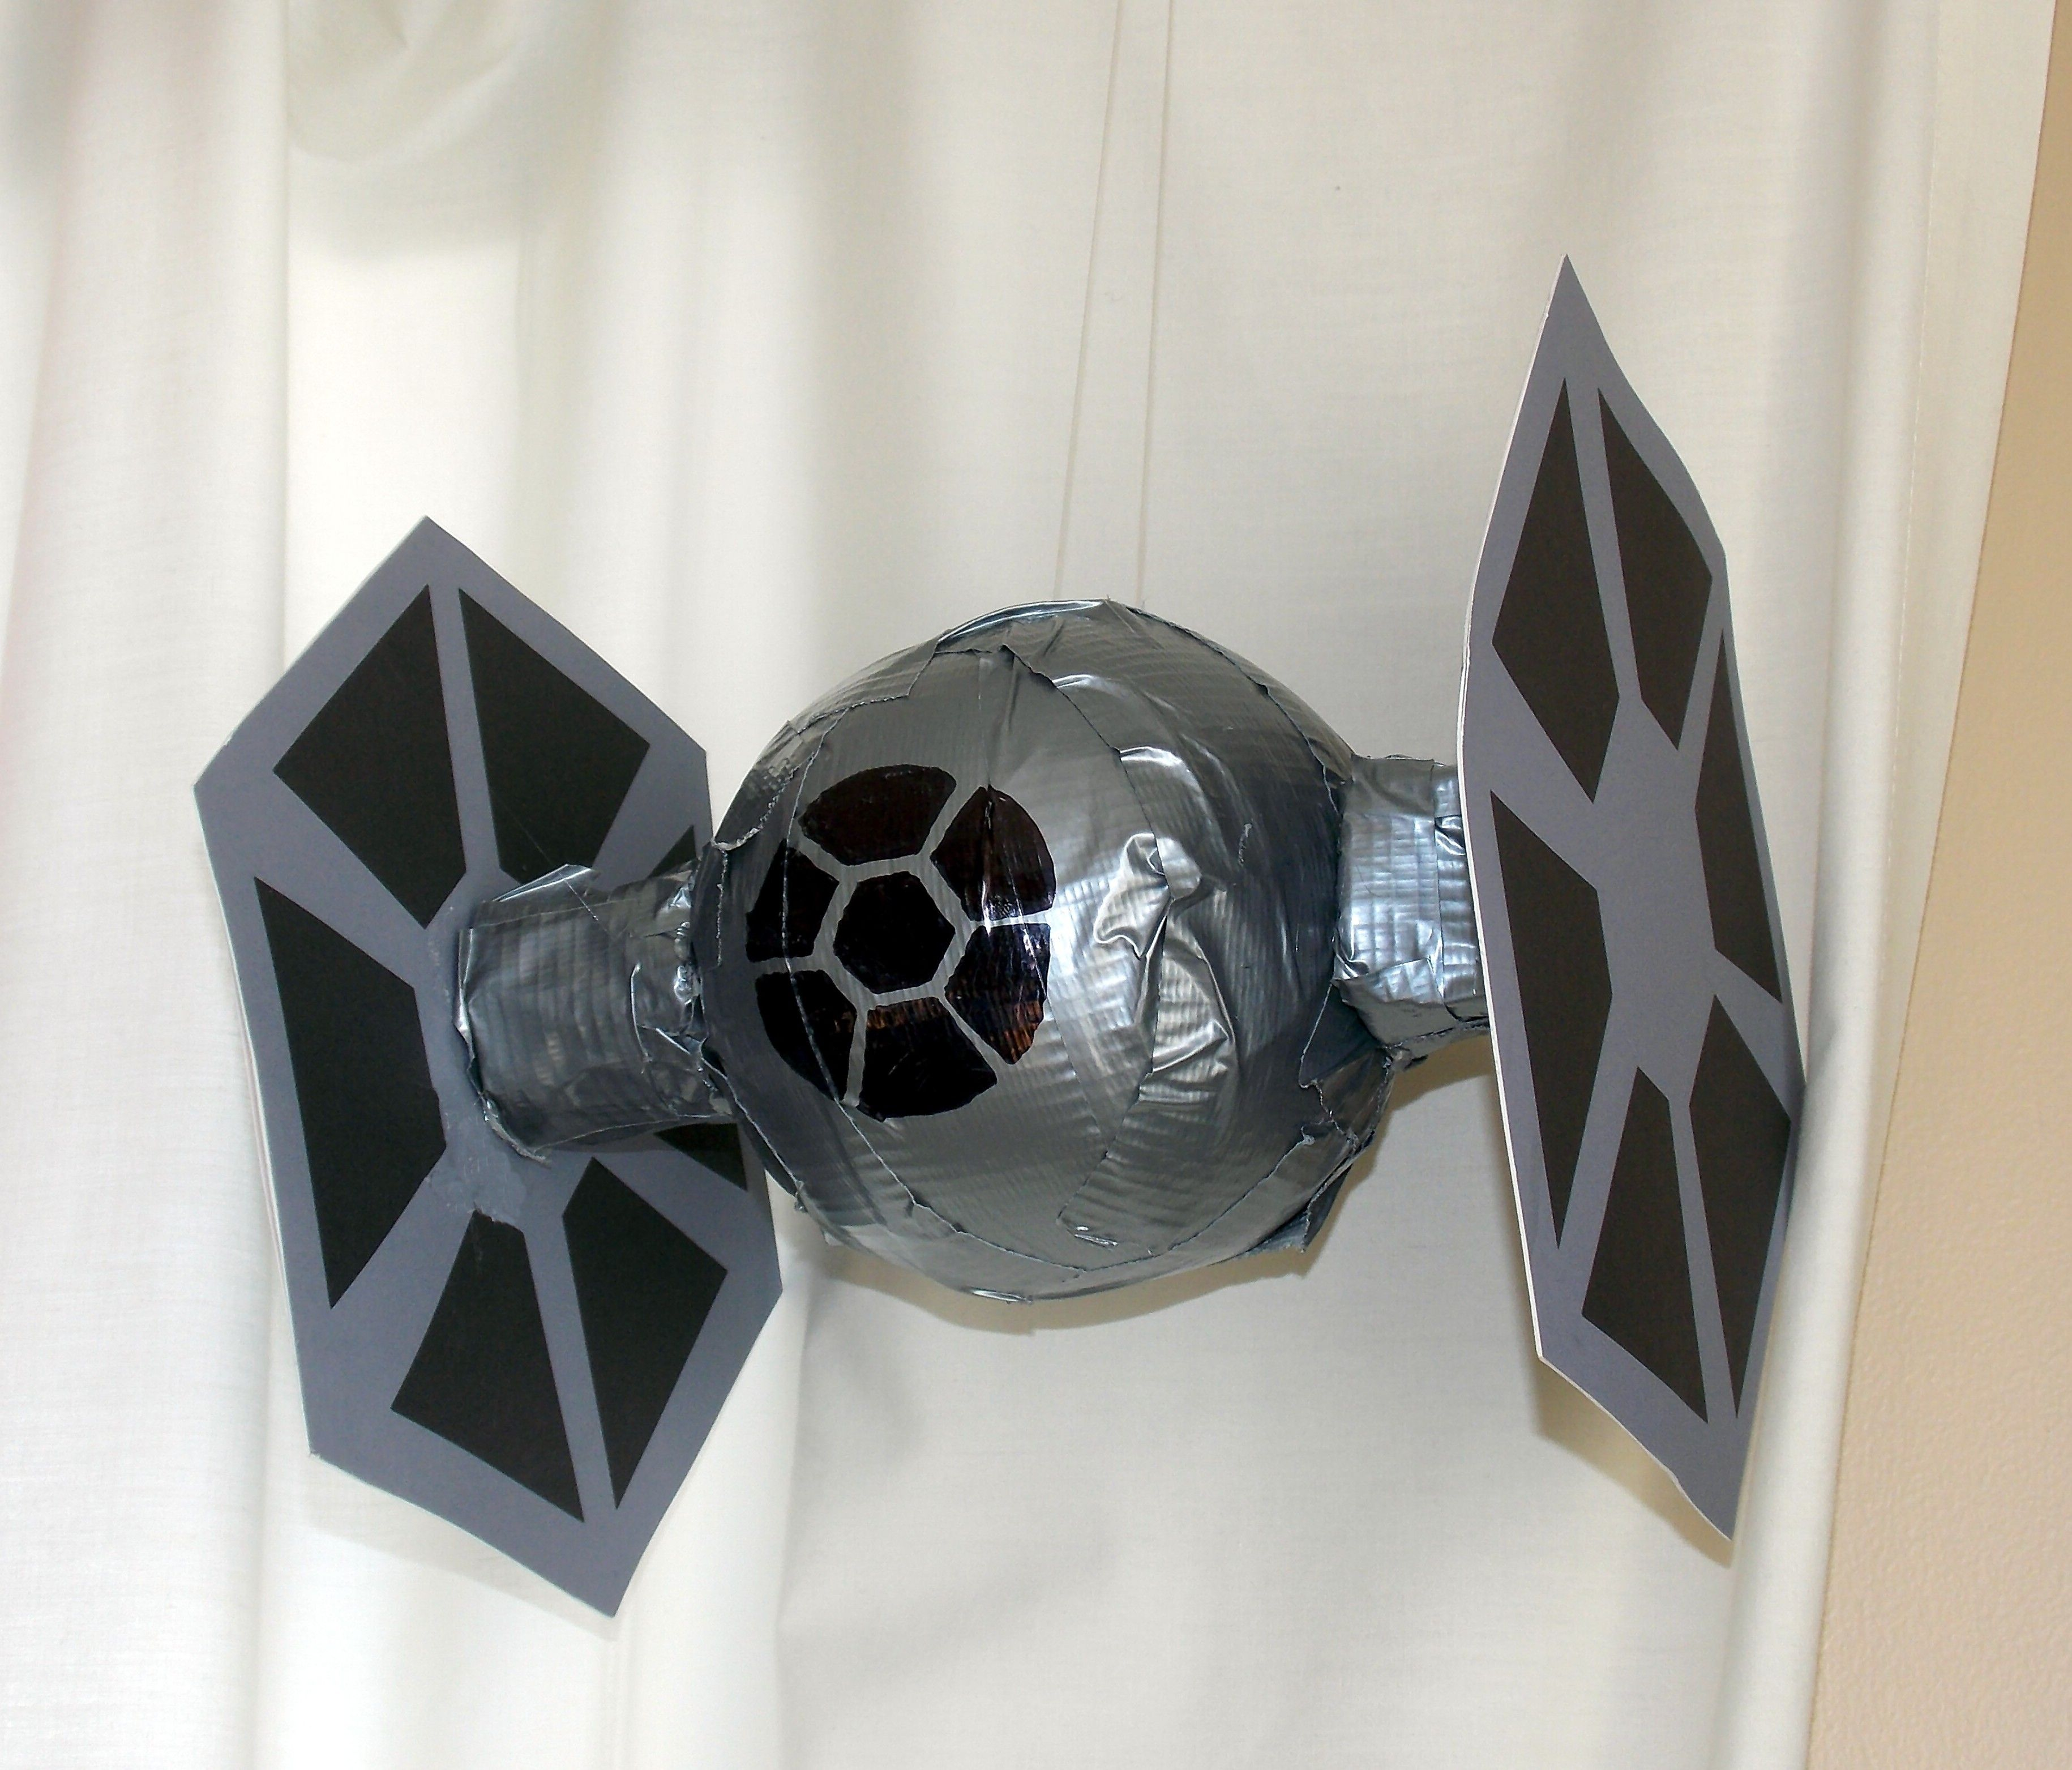 #816C4A Tie Fighter Decorations! Crafts & Party Ideas  5515 decorations de noel star wars 3660x3126 px @ aertt.com